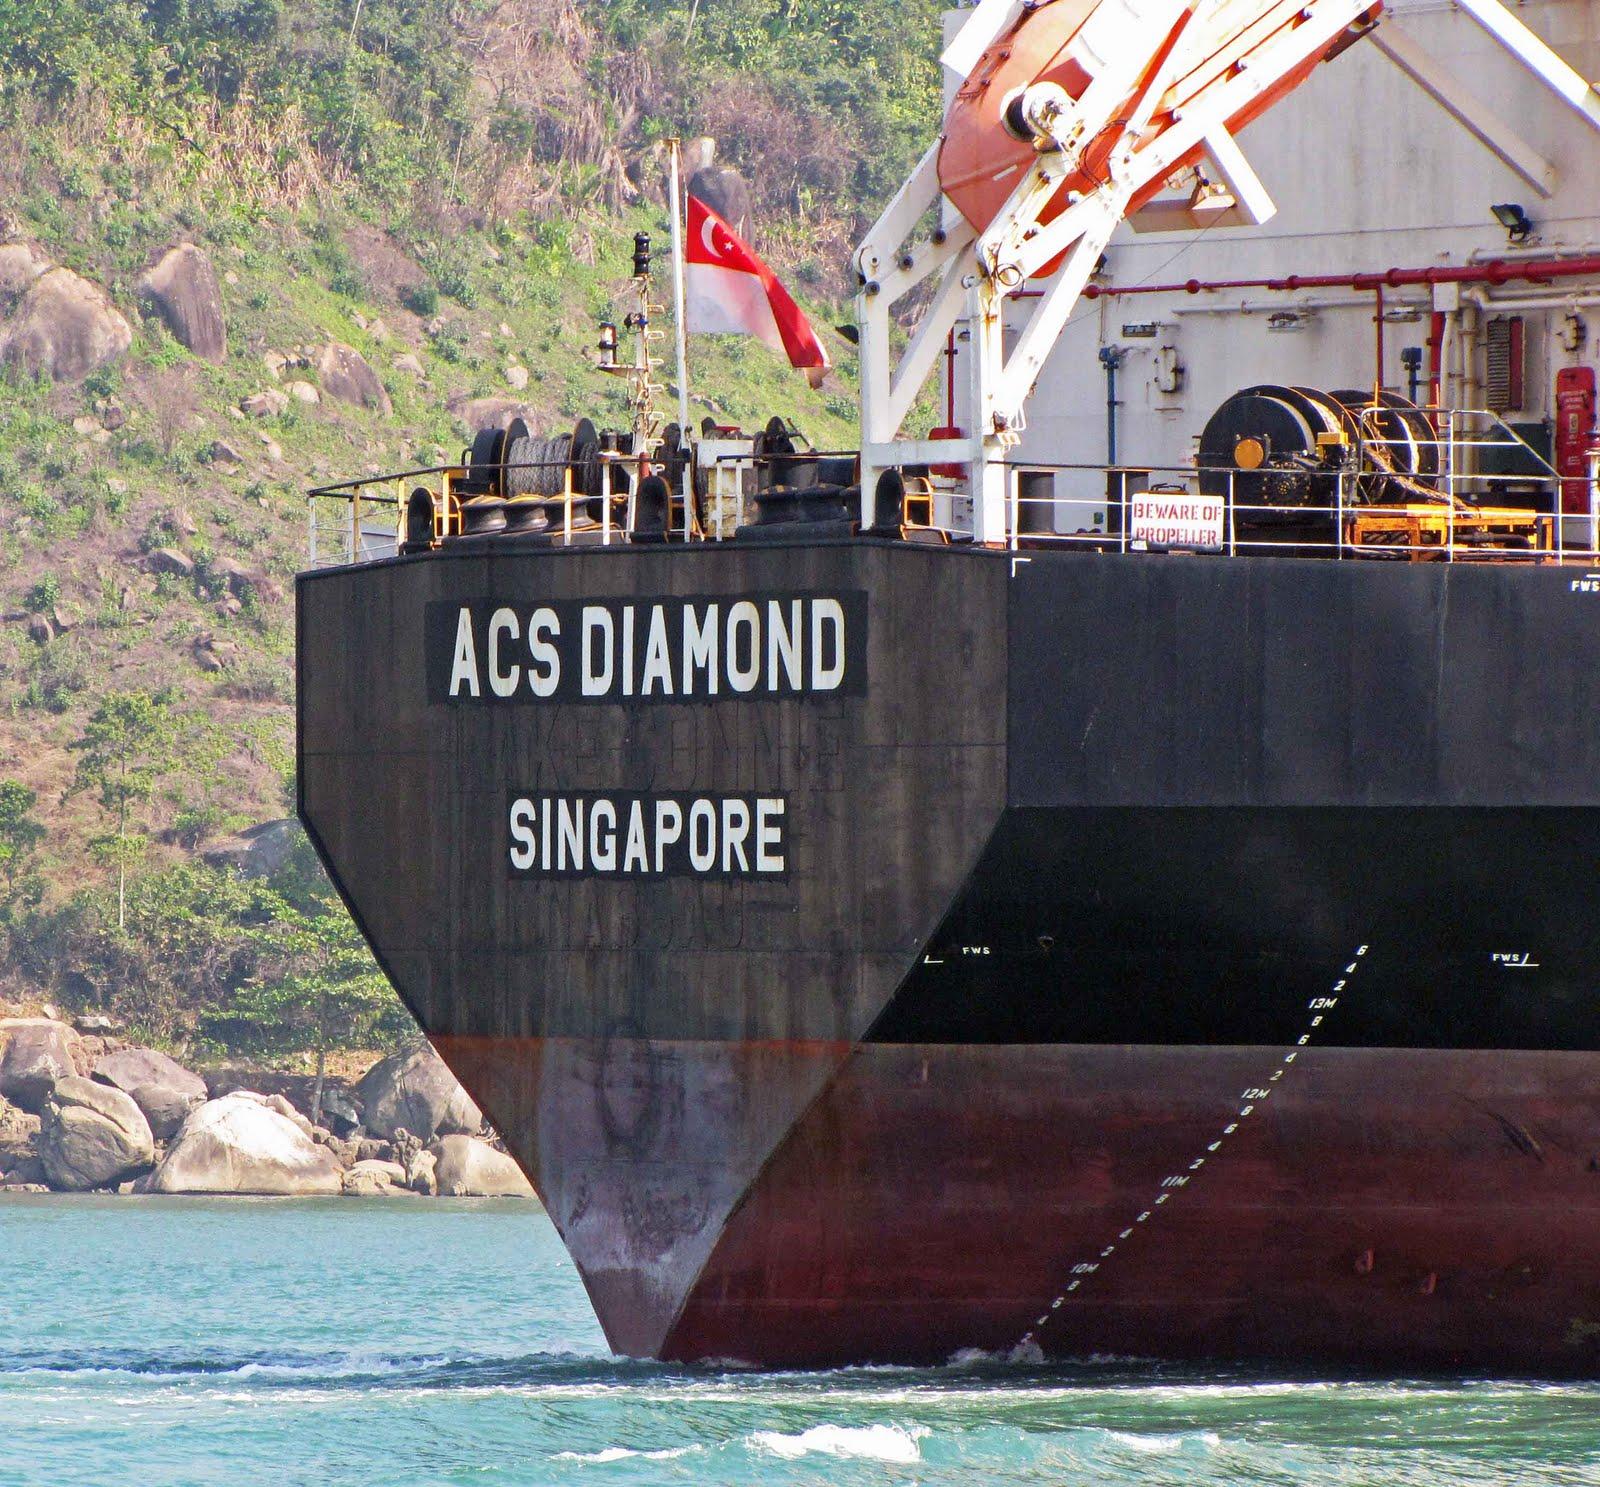 ebony ship management pte ltd singapore